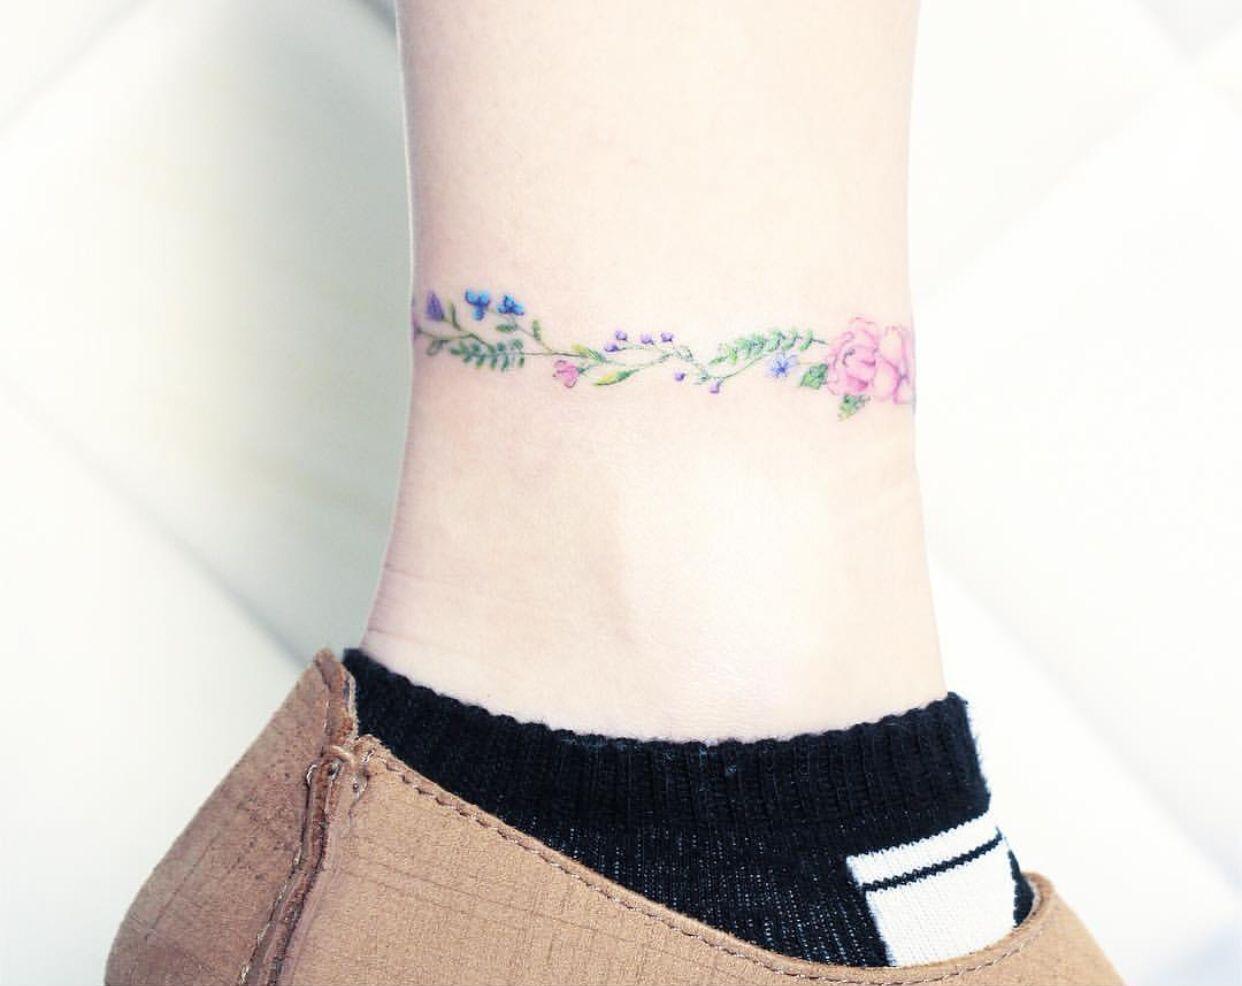 Flower Watercolor Ankle Bracelet Tattoo Tattoo Bracelet Small Tattoos Tattoos